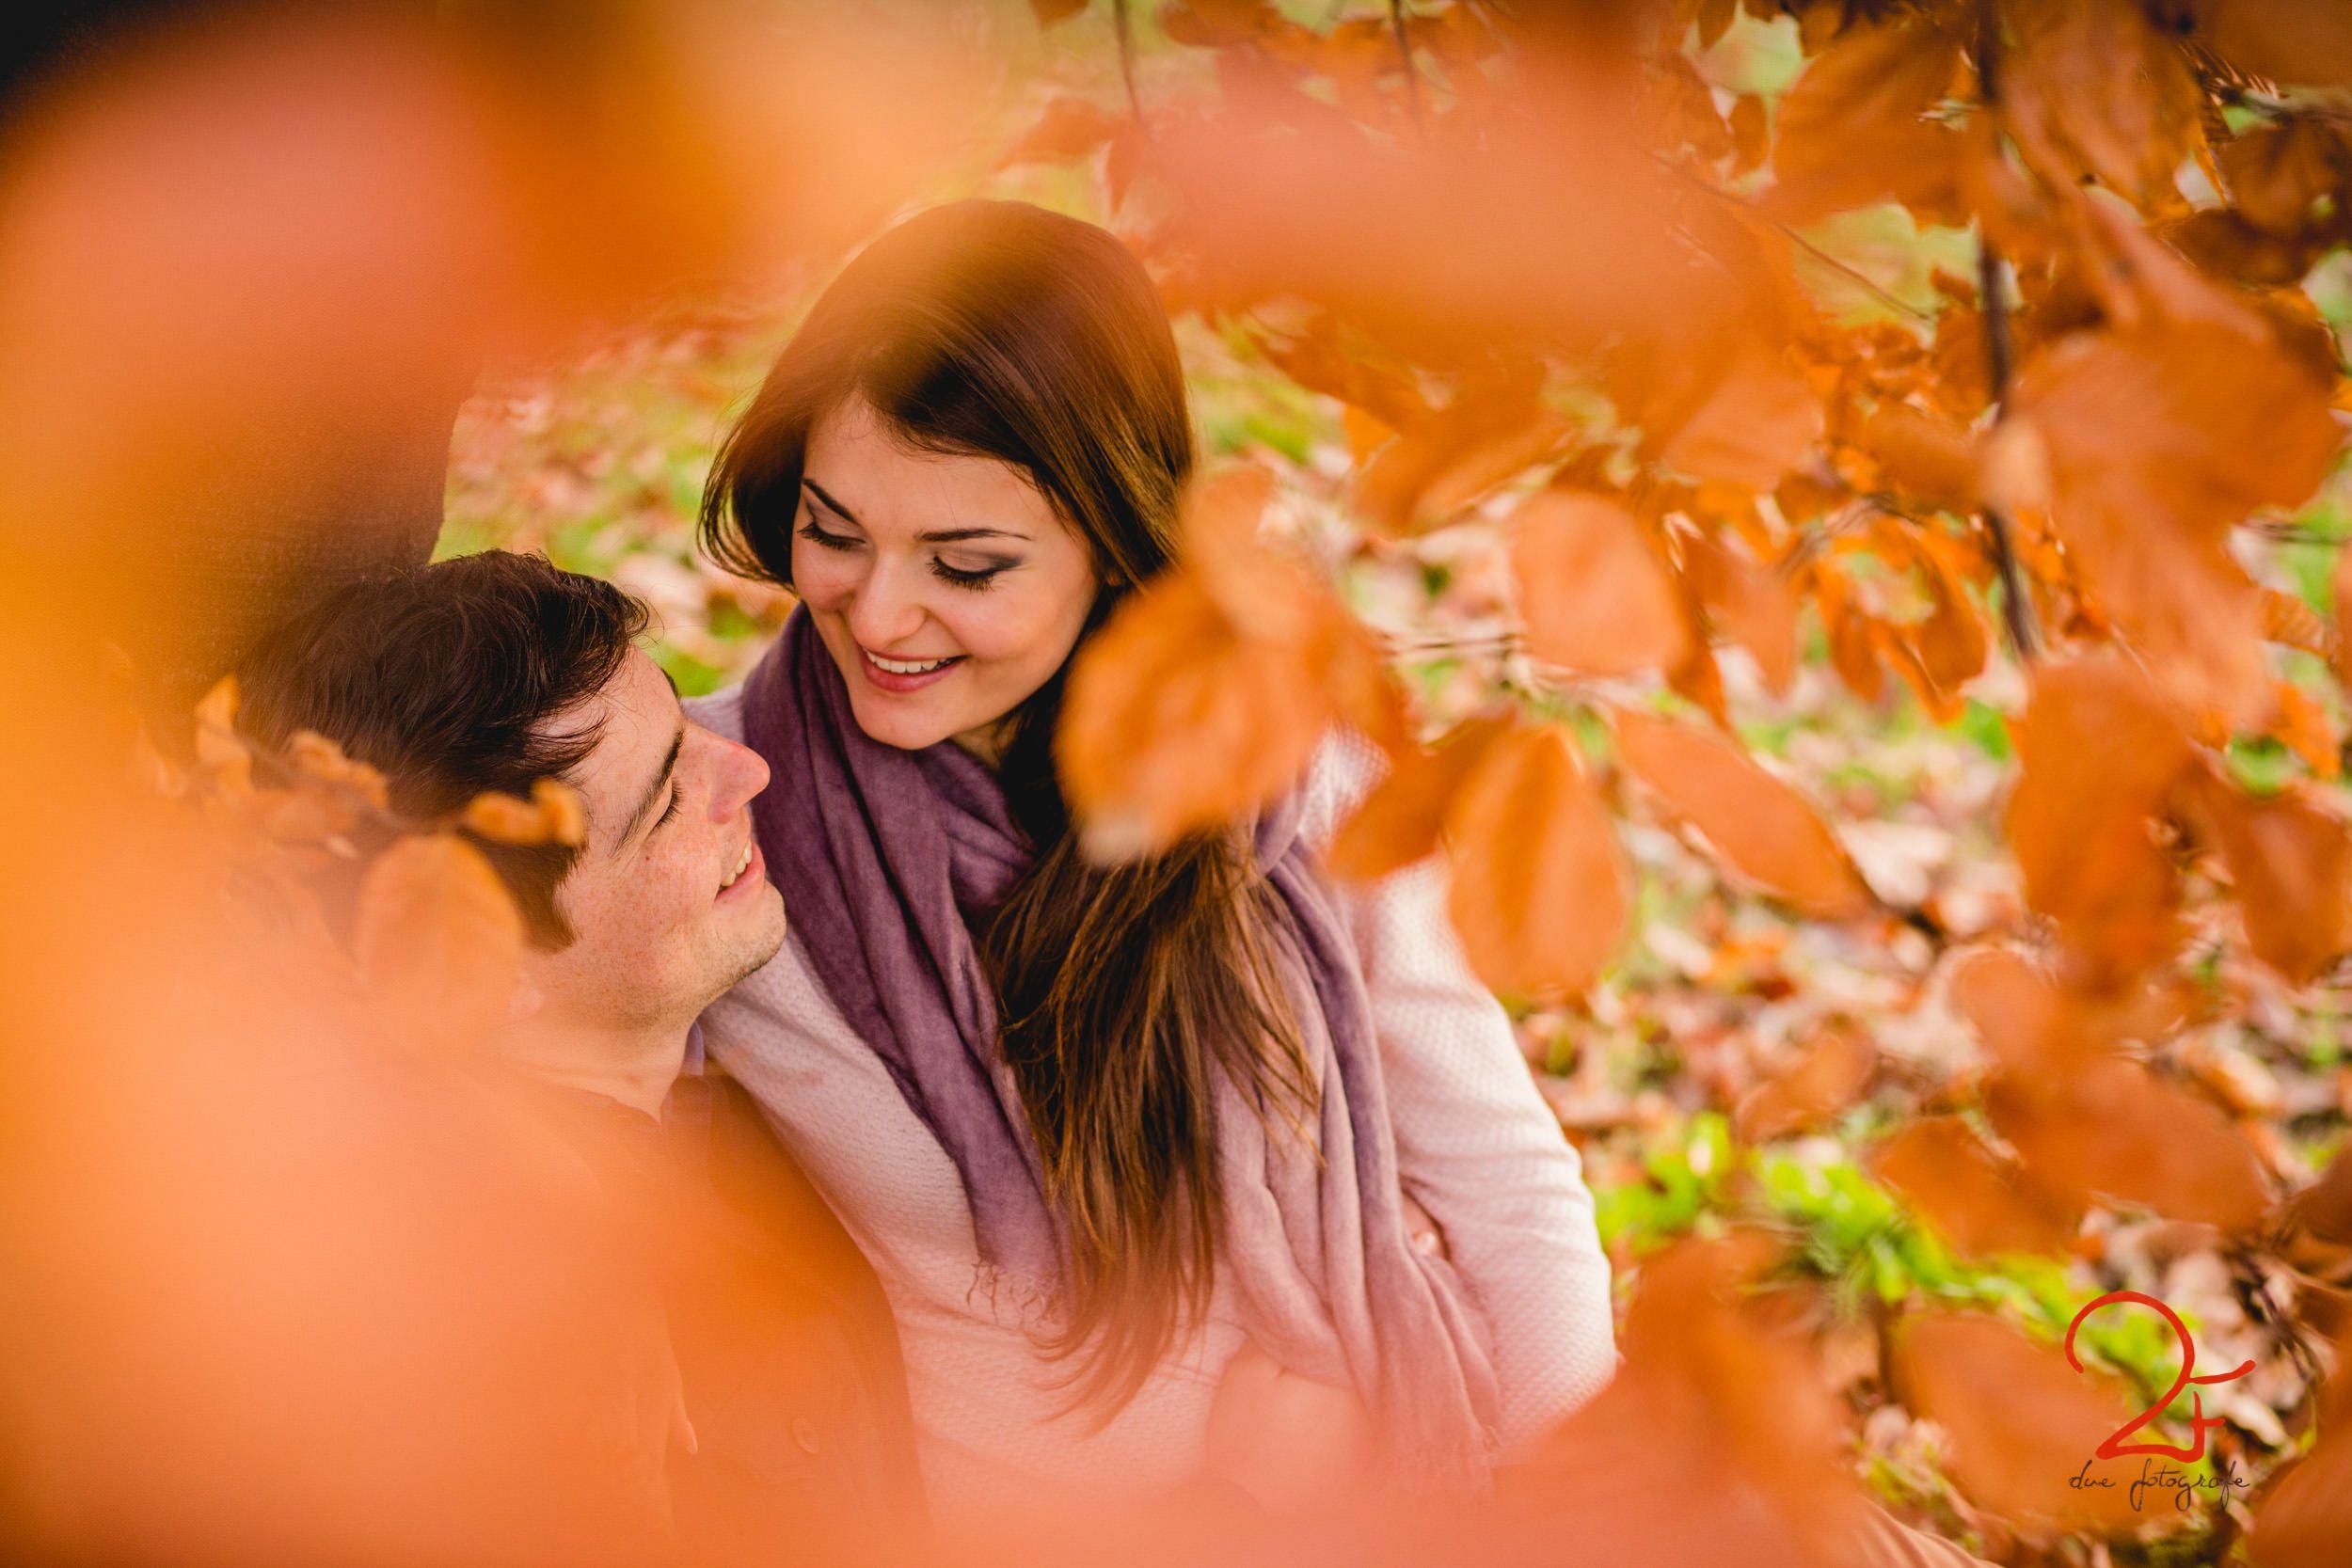 Engagement in autumn | Engagement photo inspiration | Due Fotografe | Italian wedding photographer